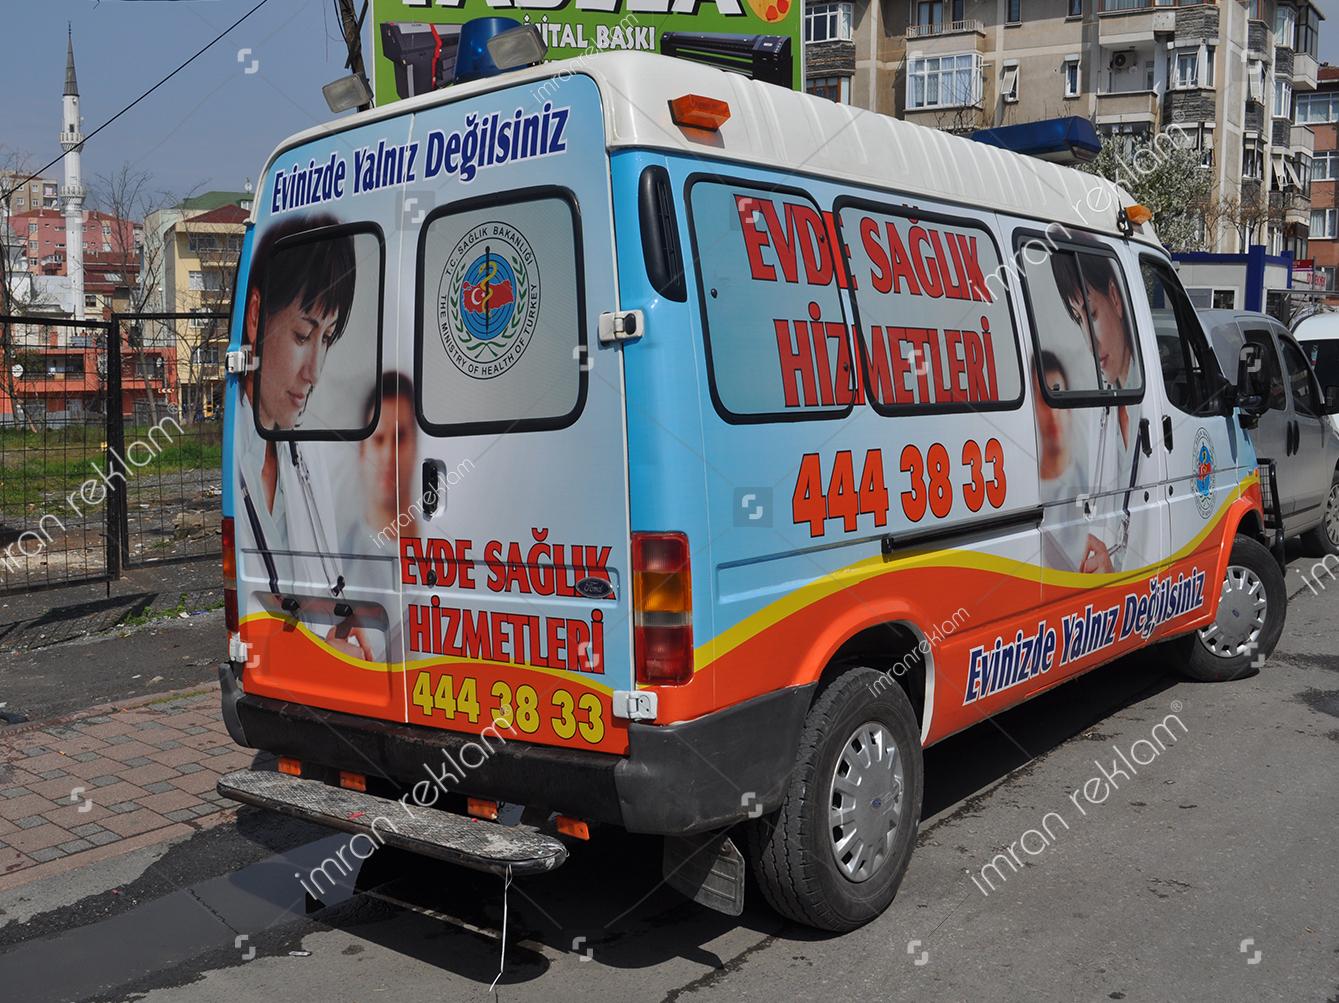 ambulans-giydirme-renk-degisimi-kaplama-ambulans-giydirme-renk-degisimi-kaplama